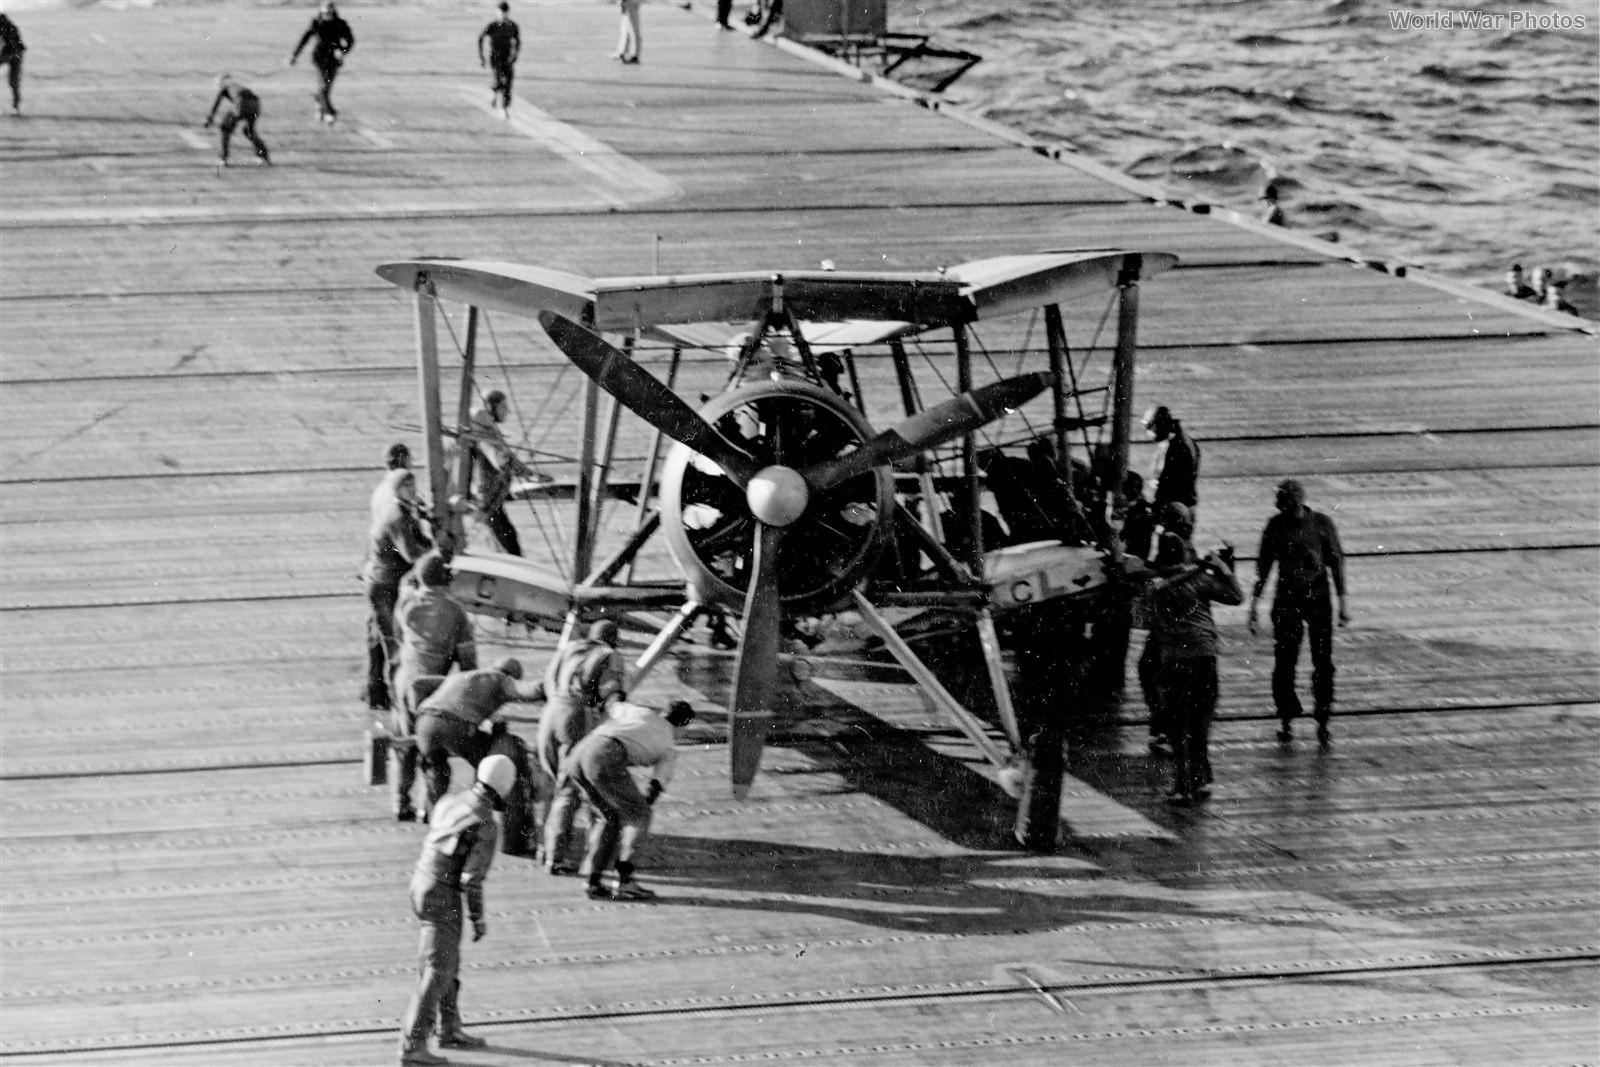 Swordfish 812 Squadron Aboard USS Wasp April 1942